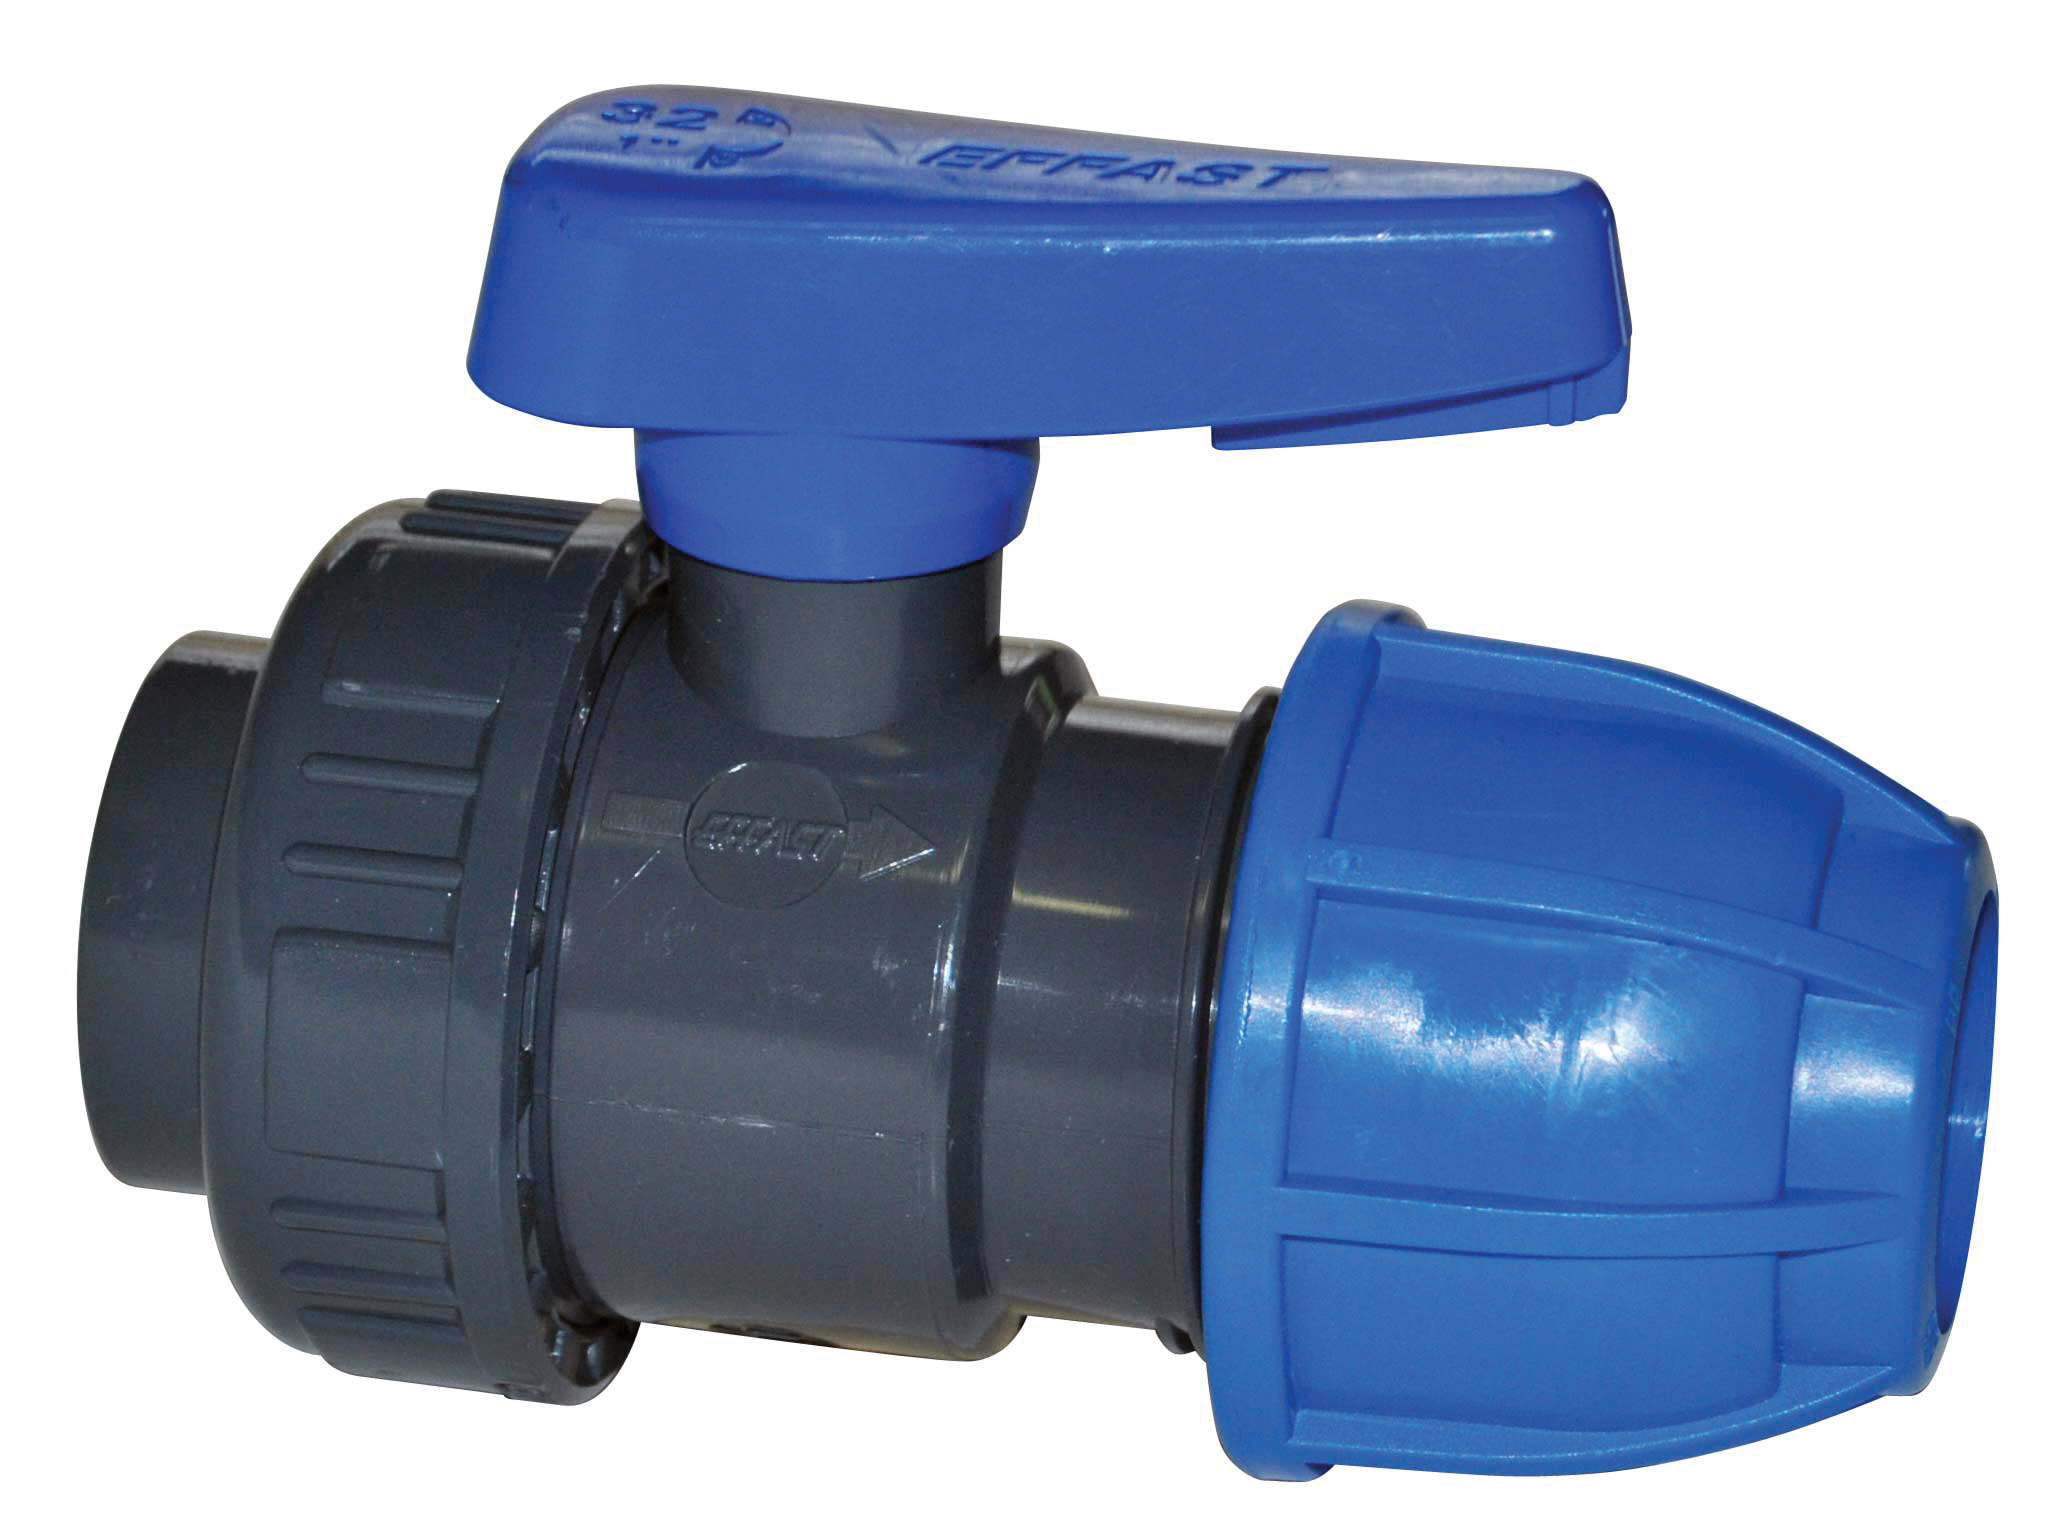 "PE-Rohr T-Stück mit AG-Abzweigung 32 mm x 1/"" x 32 mm"